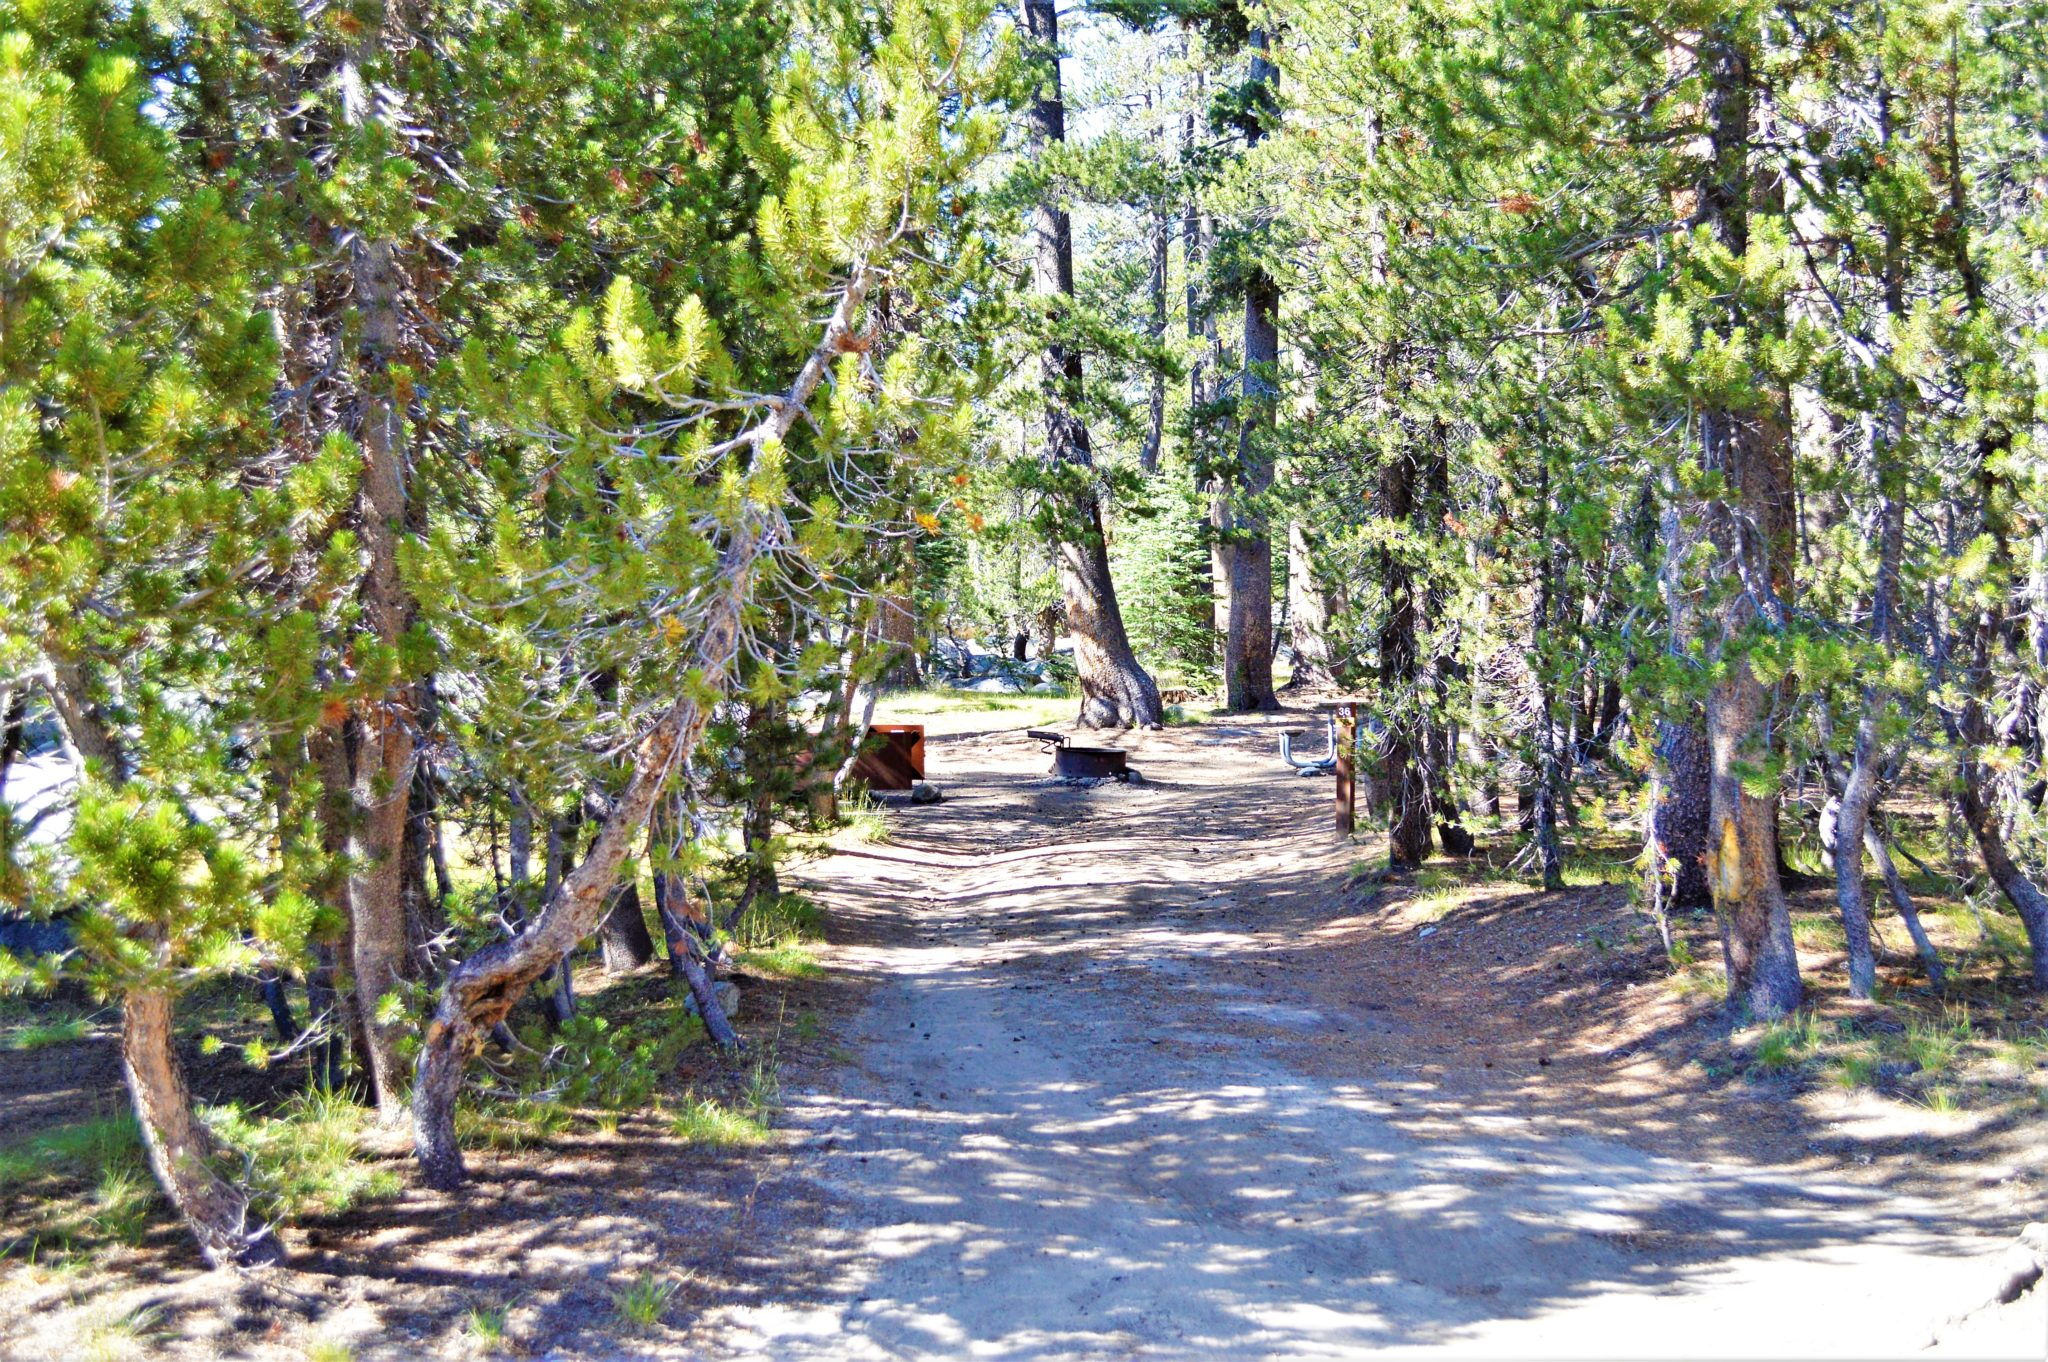 Porcupine Flat camping spot, Yosemite, California